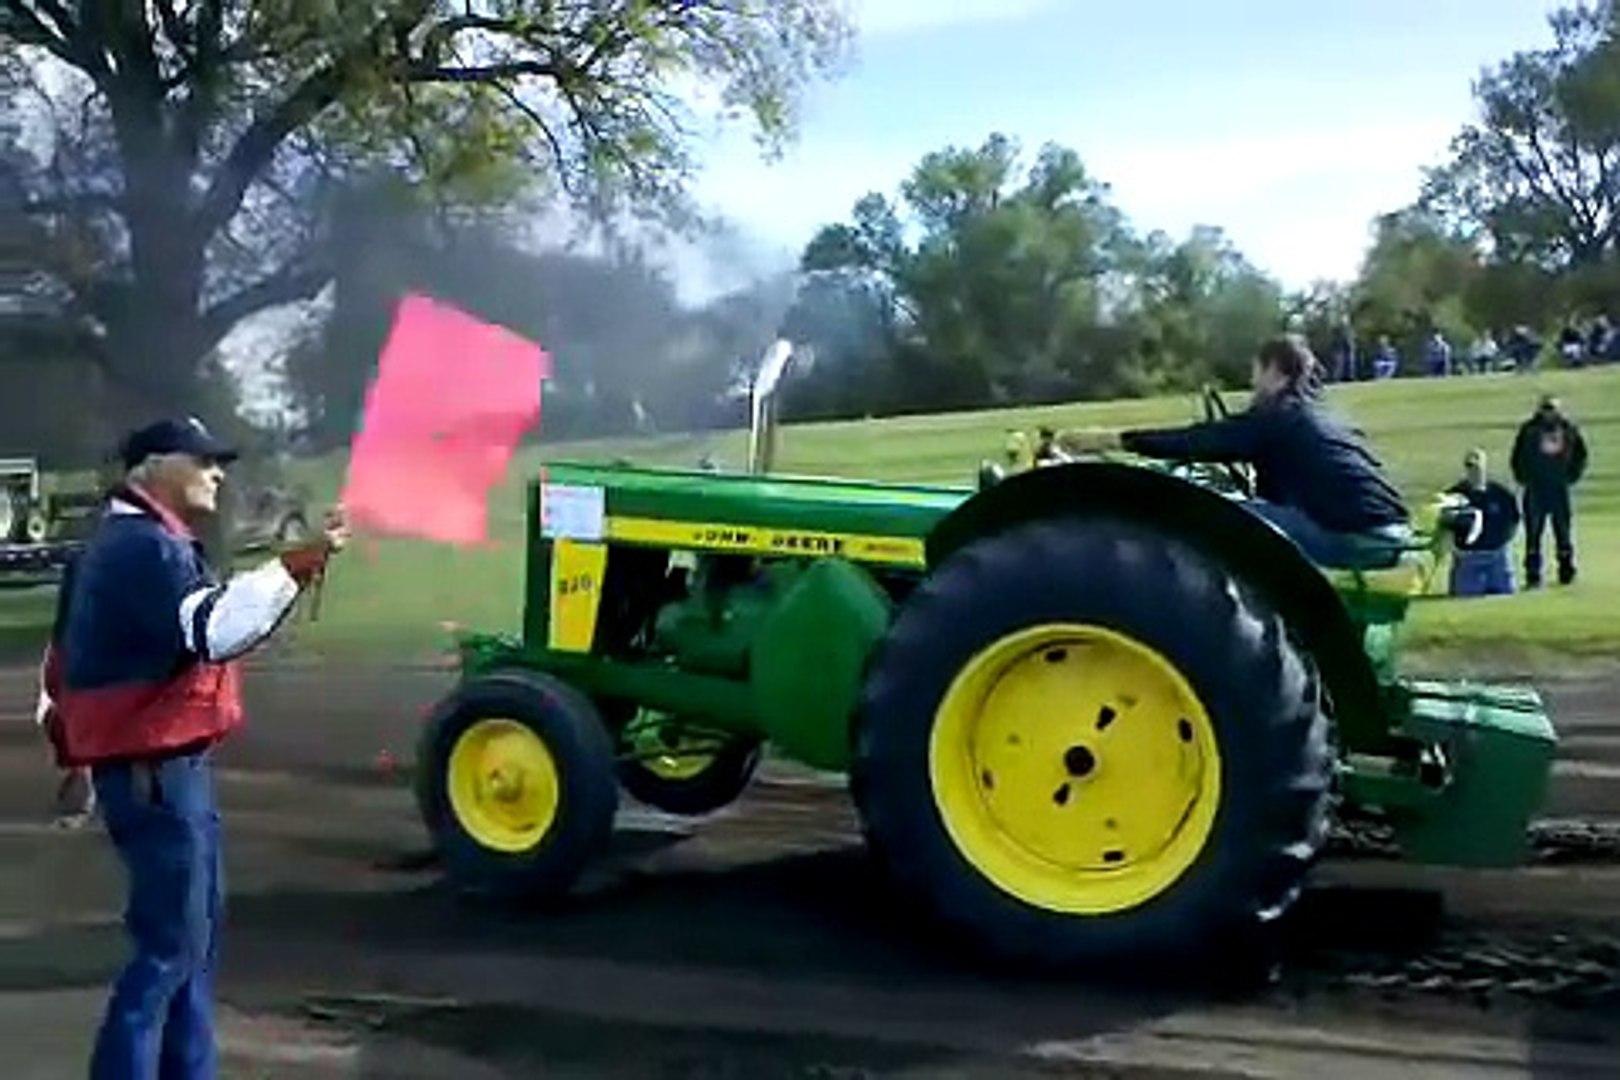 John Deere R tractor pull 10500 class win outpulls 2 820's Enderlin ND 2010